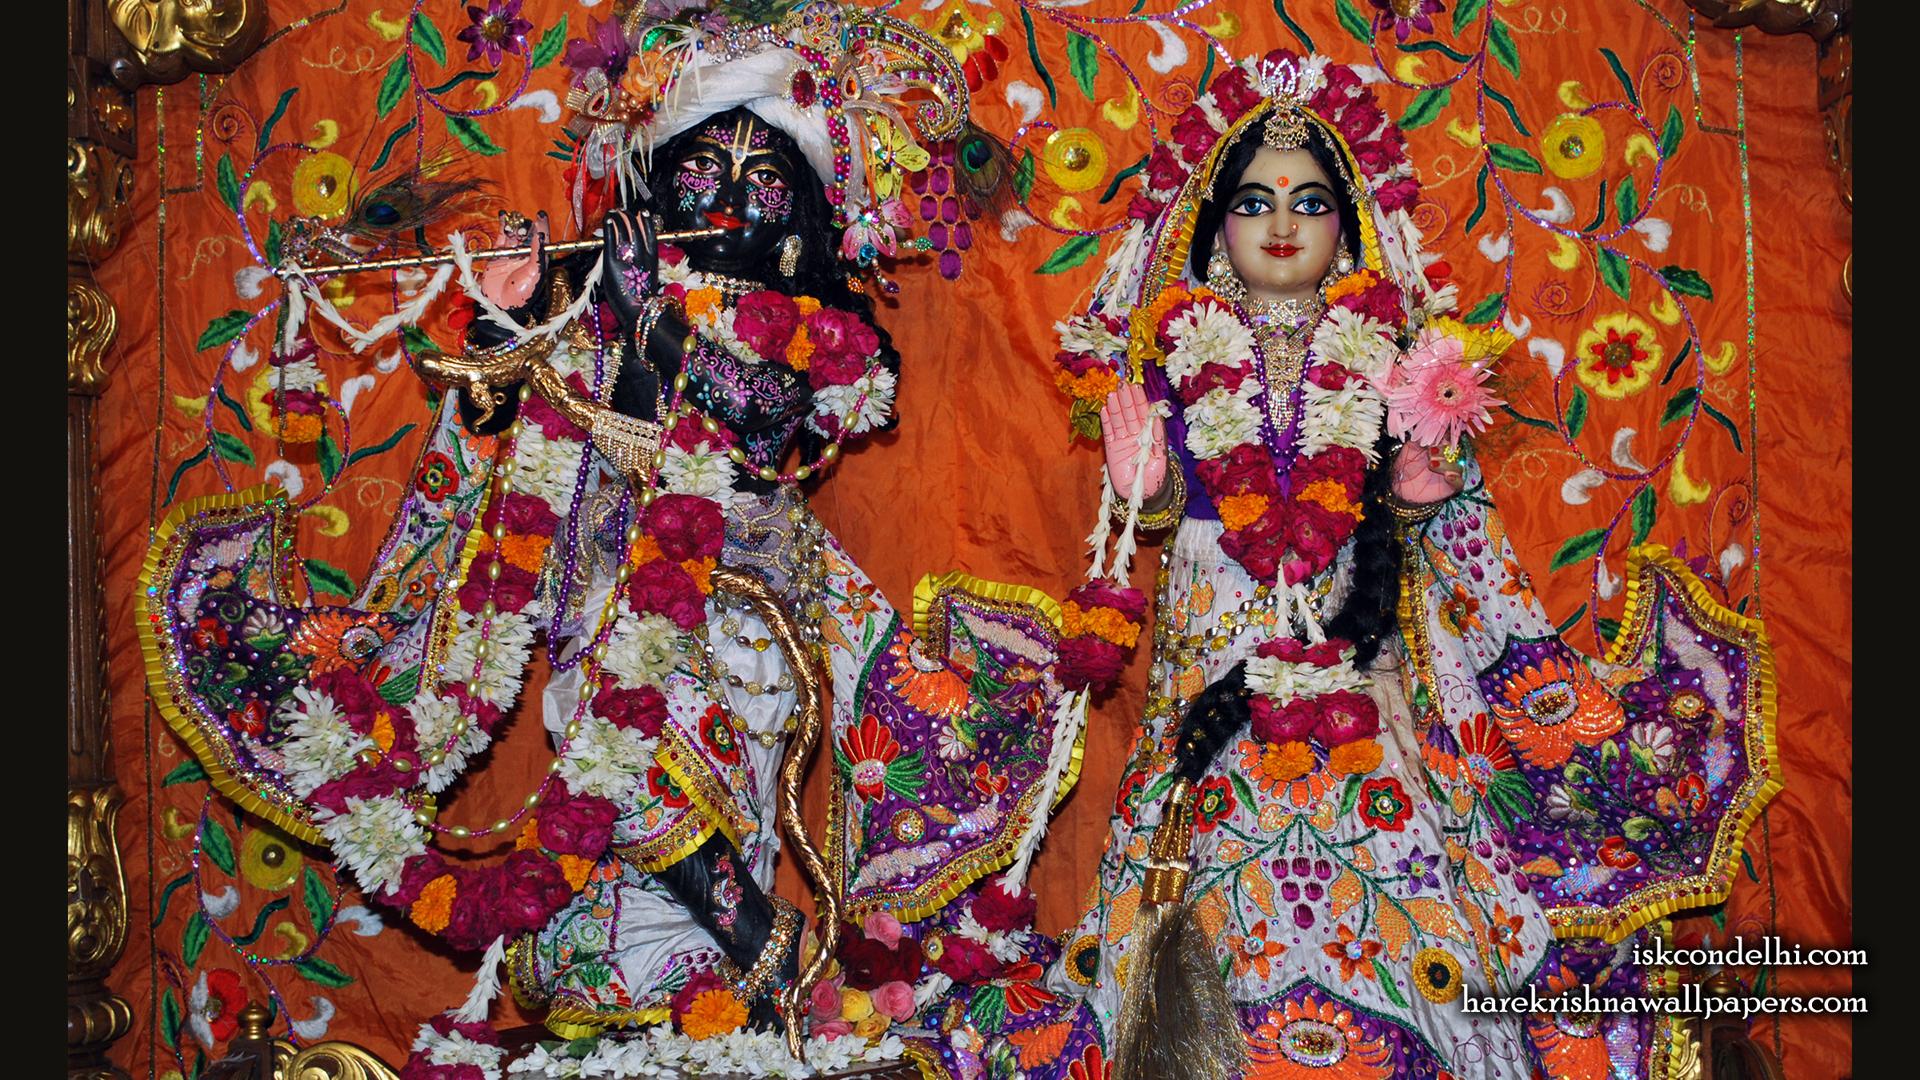 Sri Sri Radha Parthasarathi Wallpaper (013) Size 1920x1080 Download